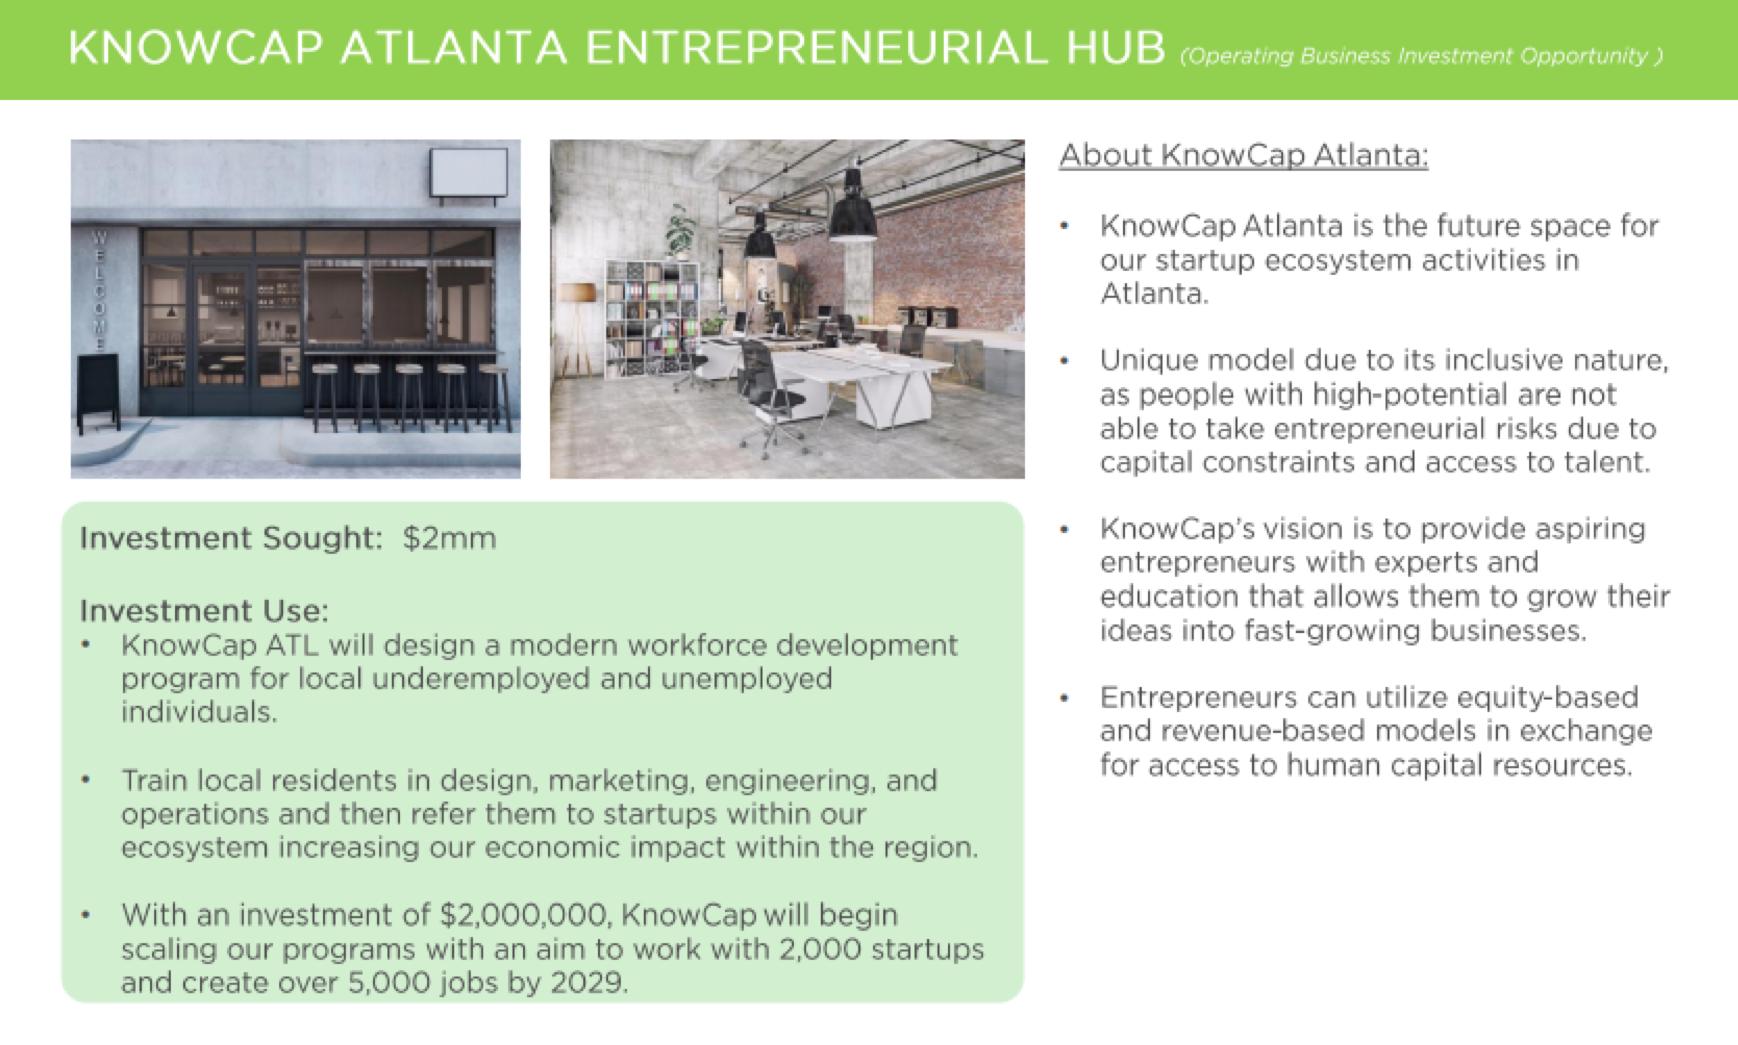 InvestAtlanta_Knowcap.png